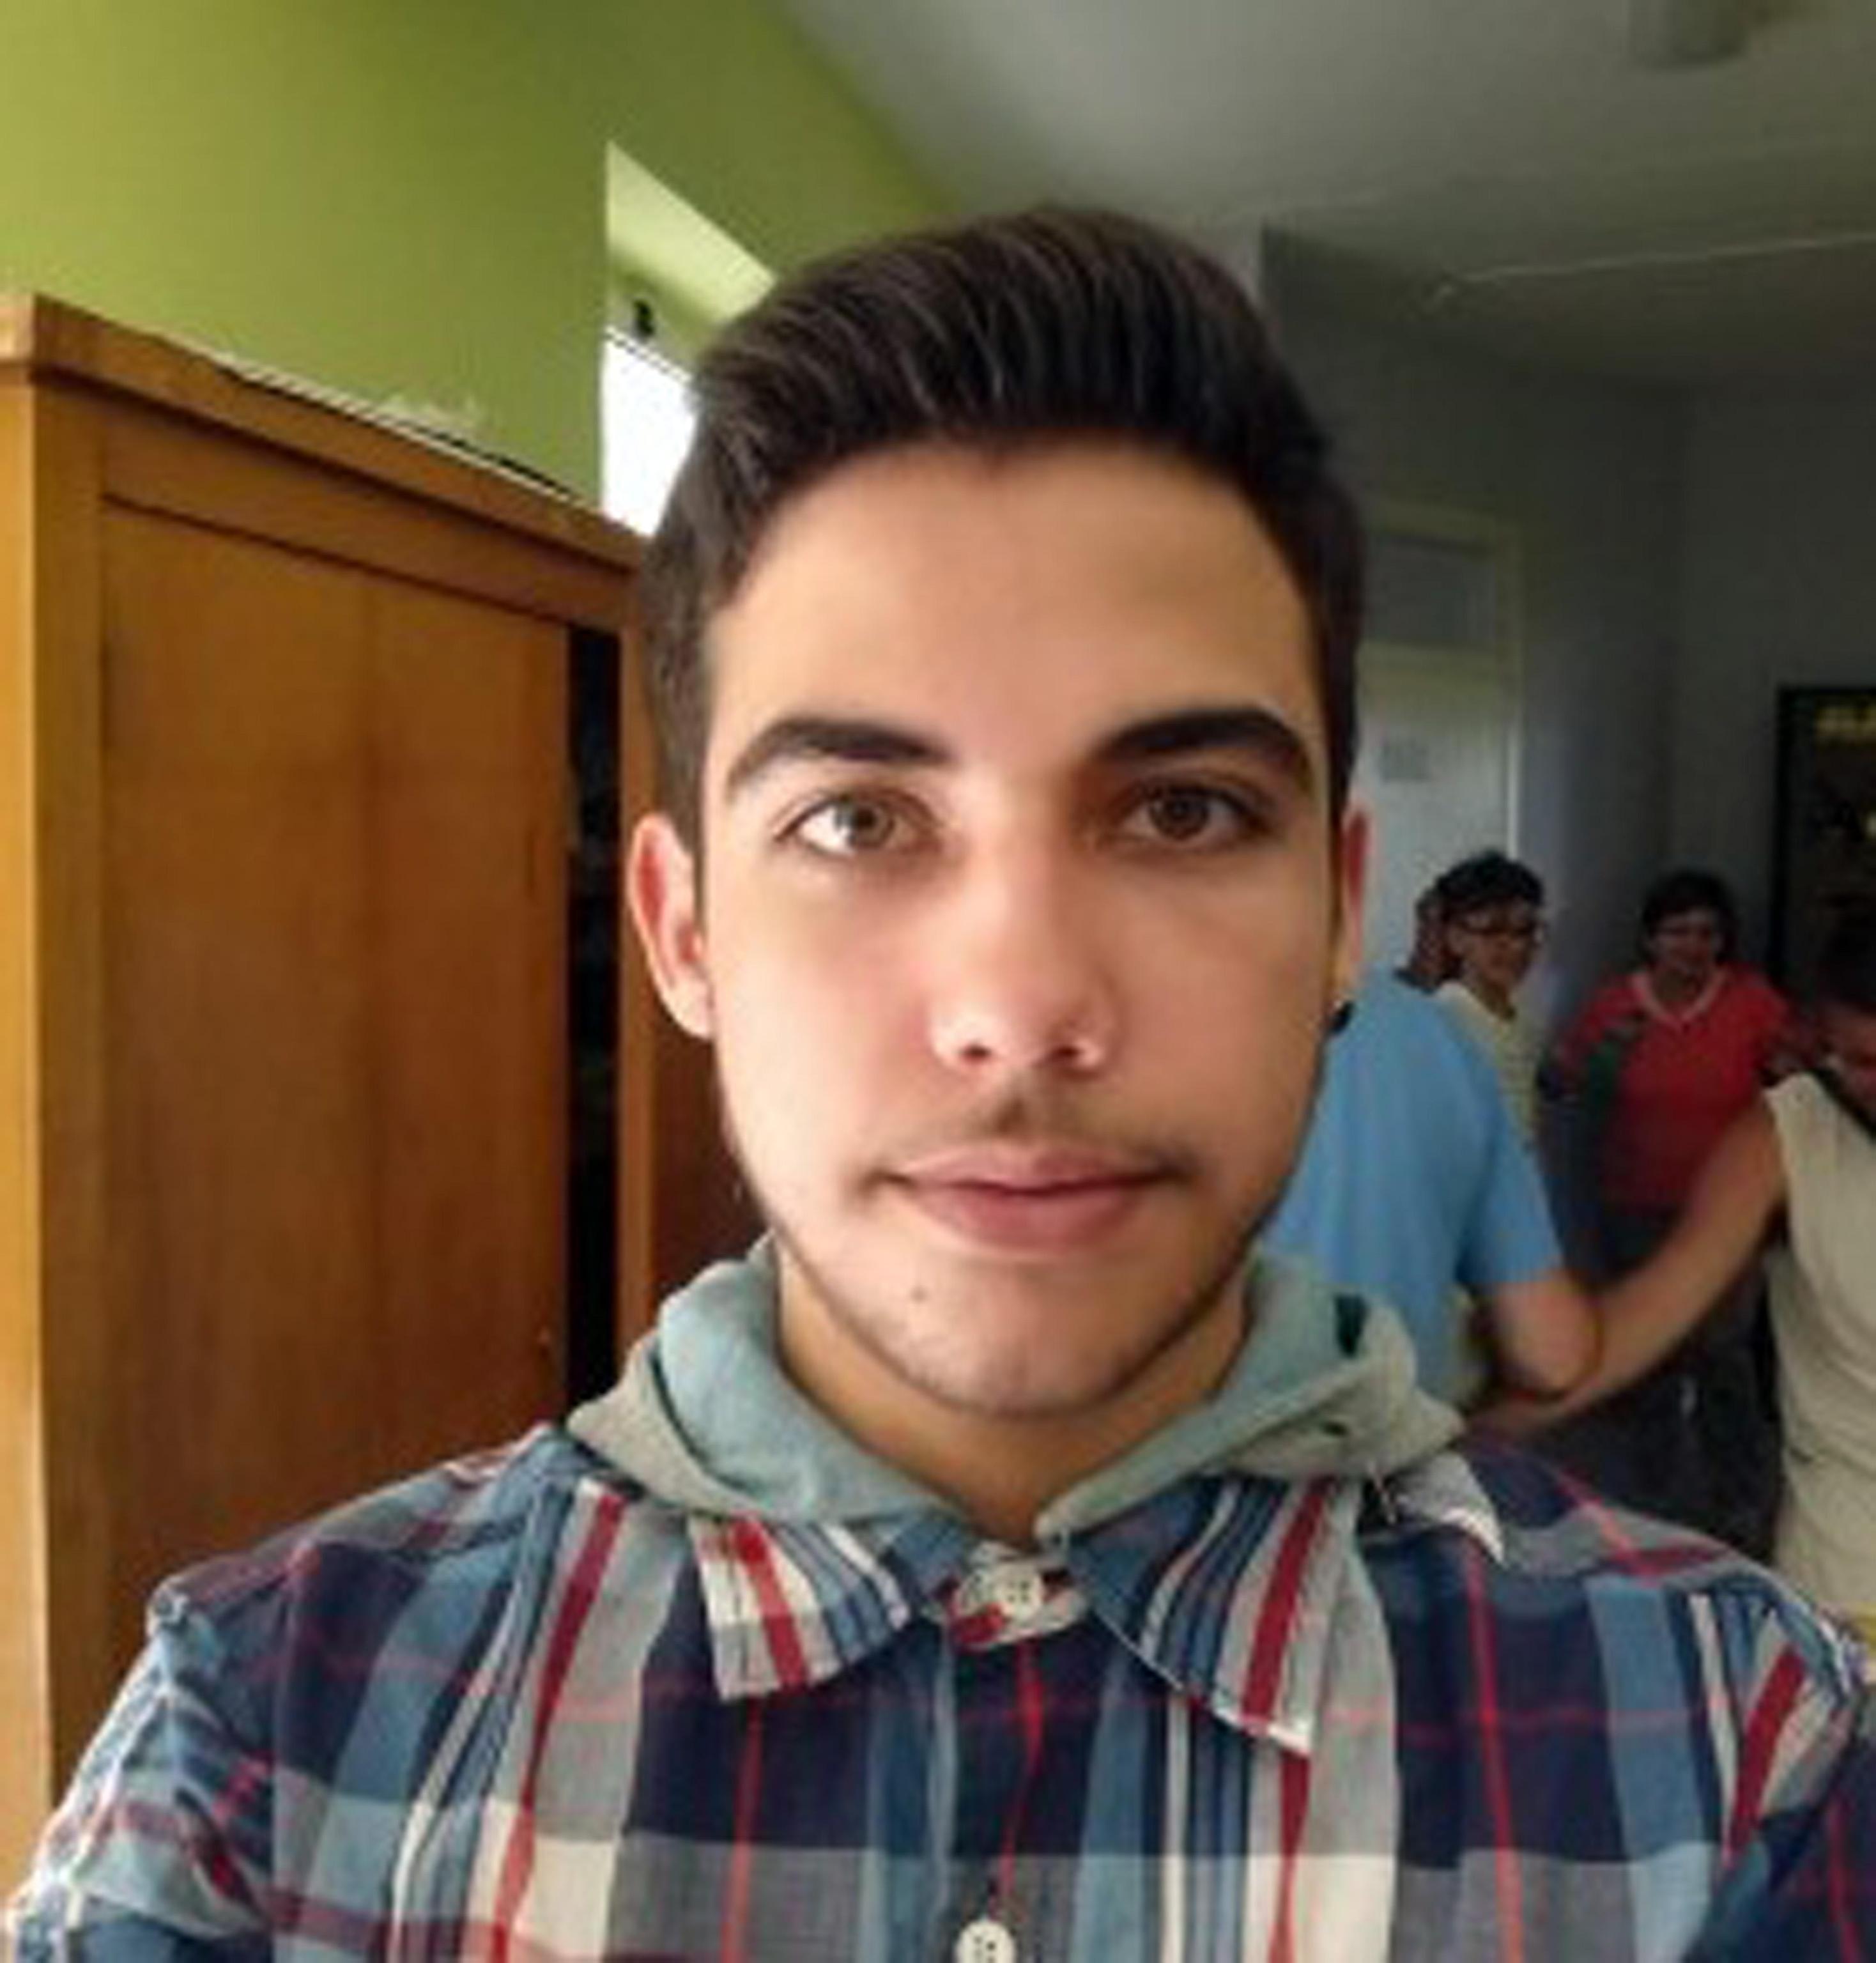 18enne uccide a coltellate un coetaneo per pochi grammi di marijuana